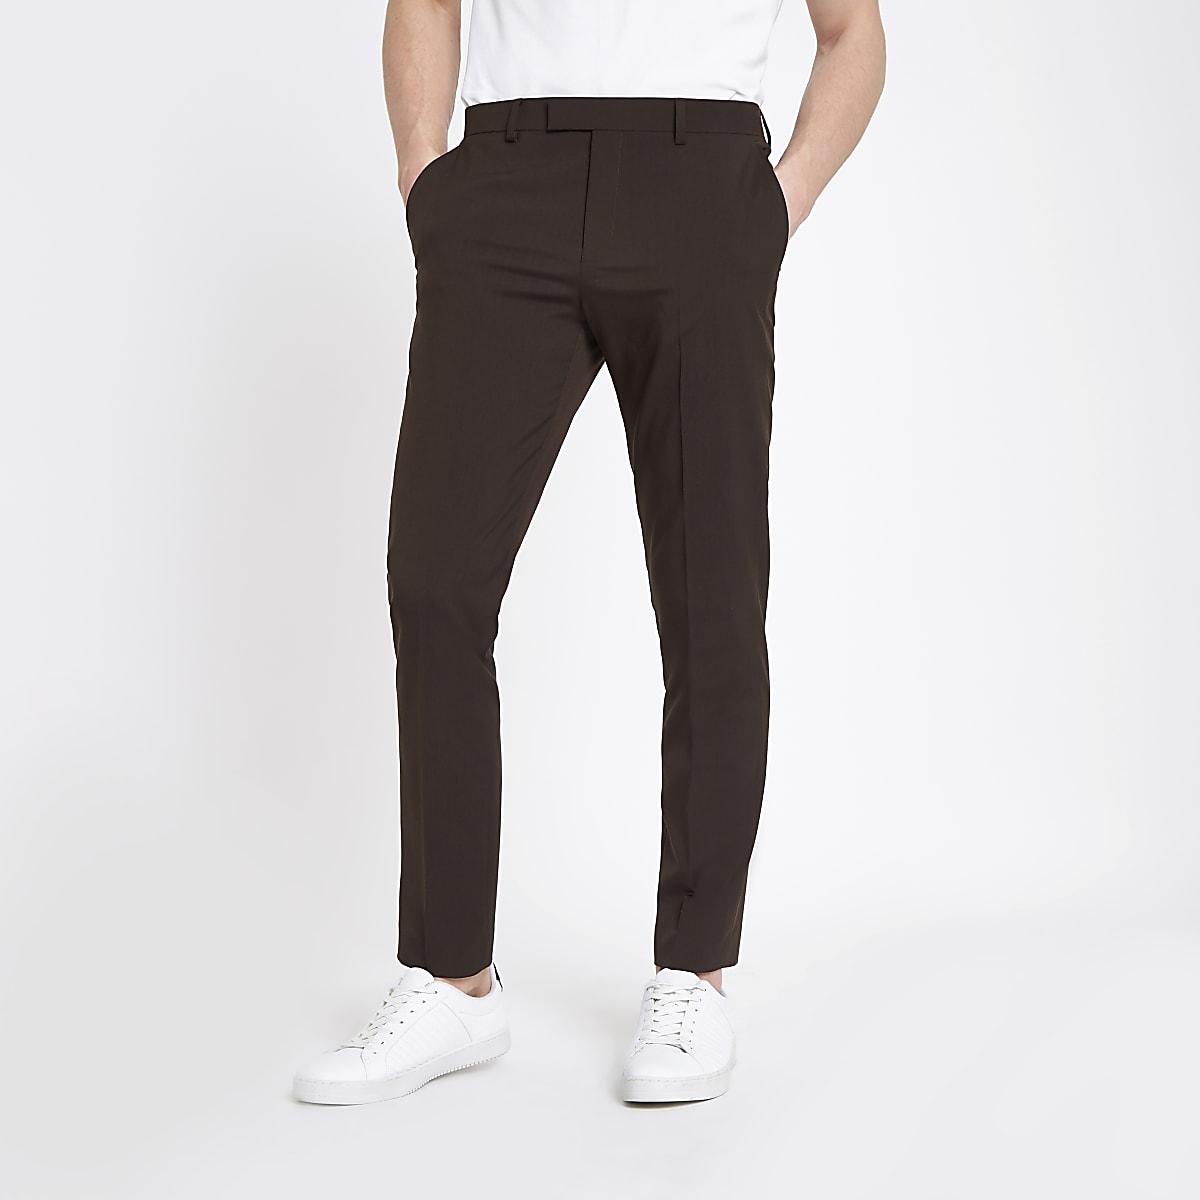 De Skinny Costume MarronRiver Island Pantalon g7yvI6bfY